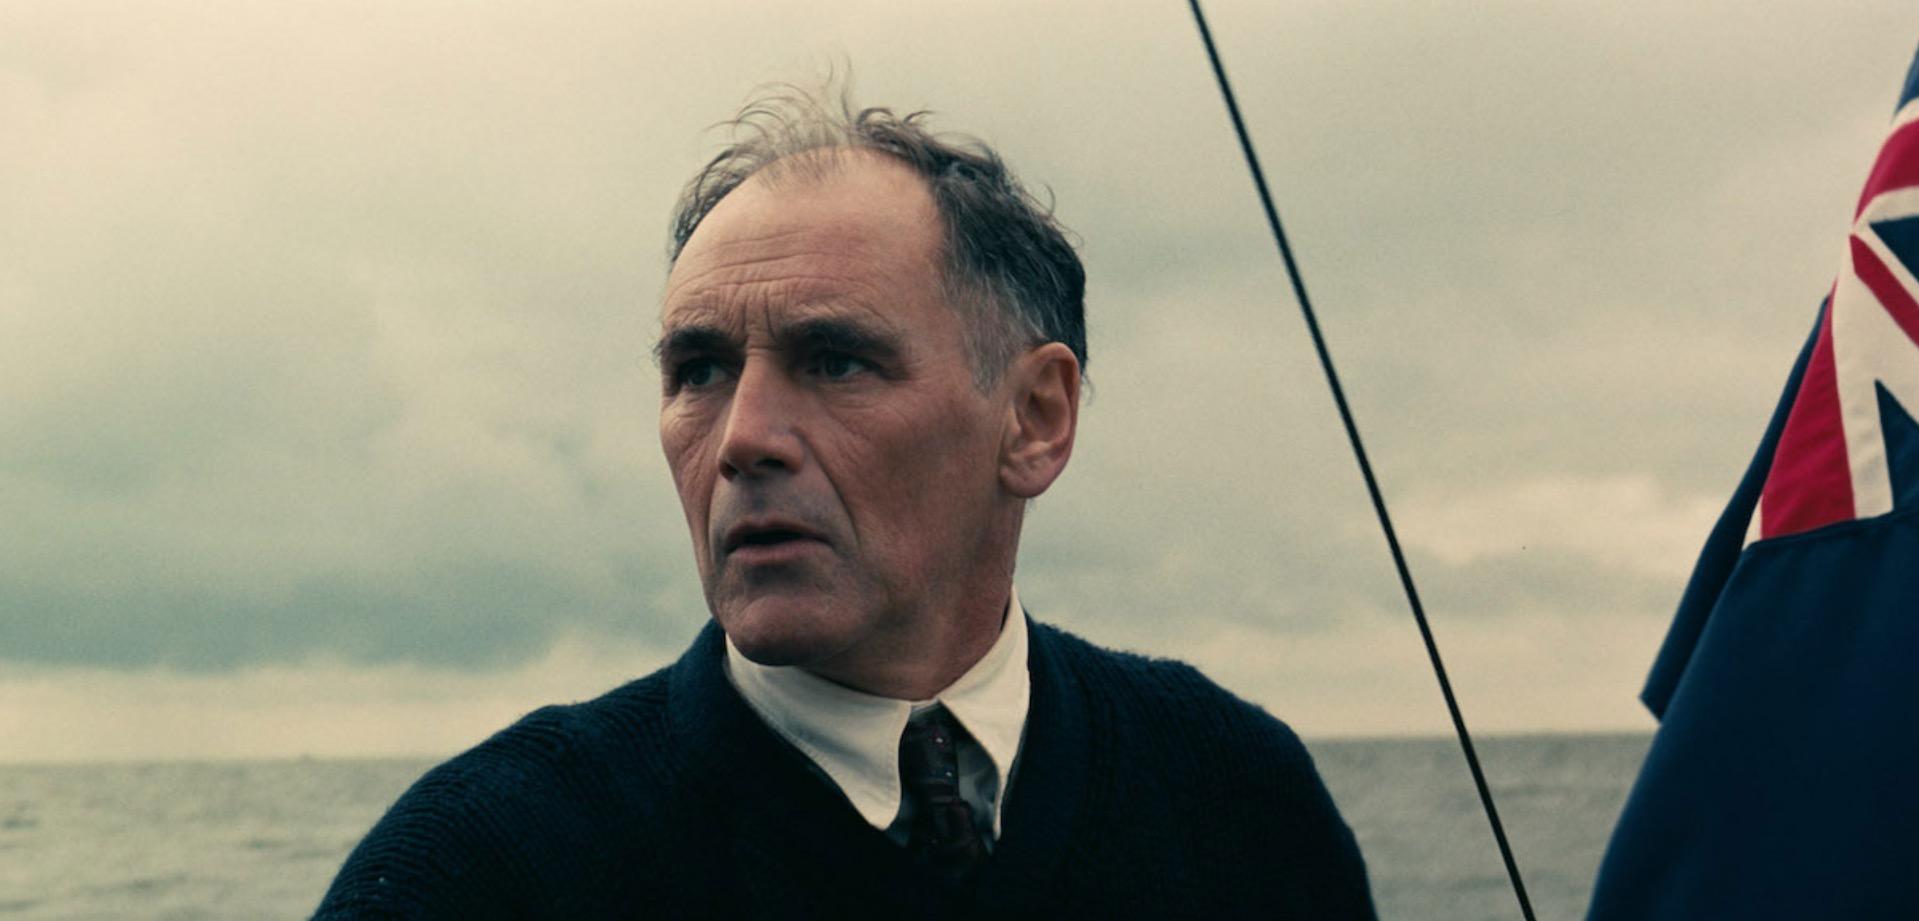 Mark Rylance in Dunkirk